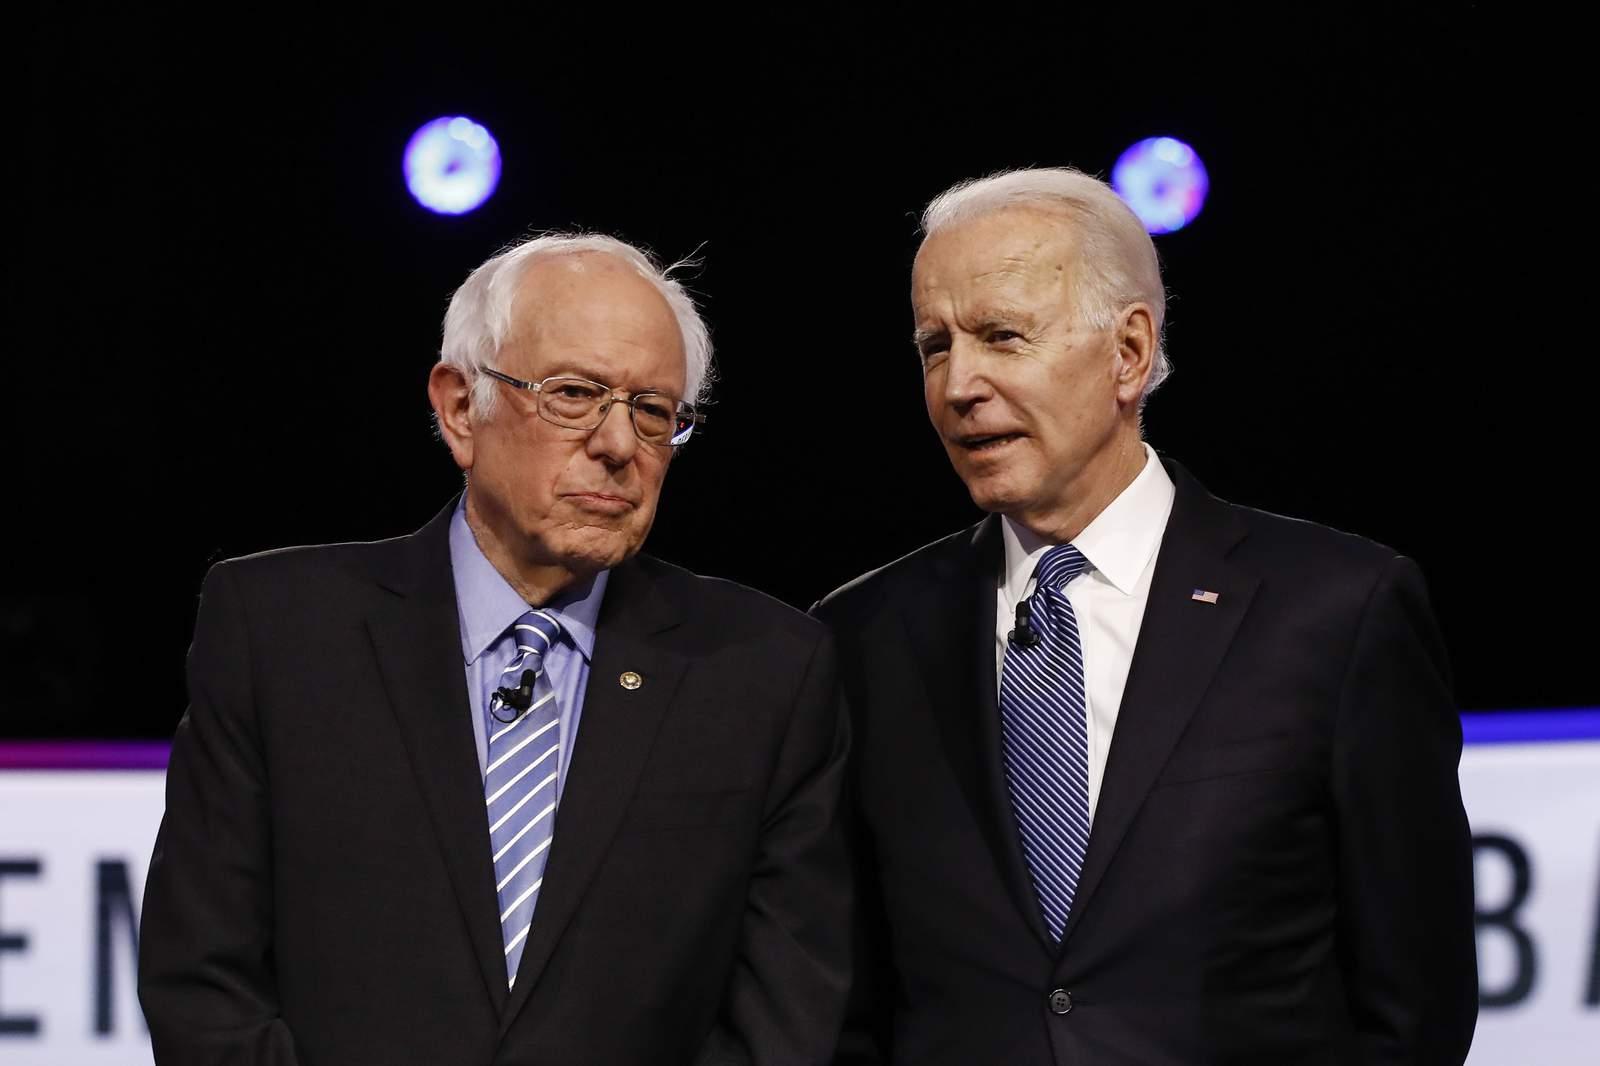 Biden wins 5 states, Sanders takes 2...